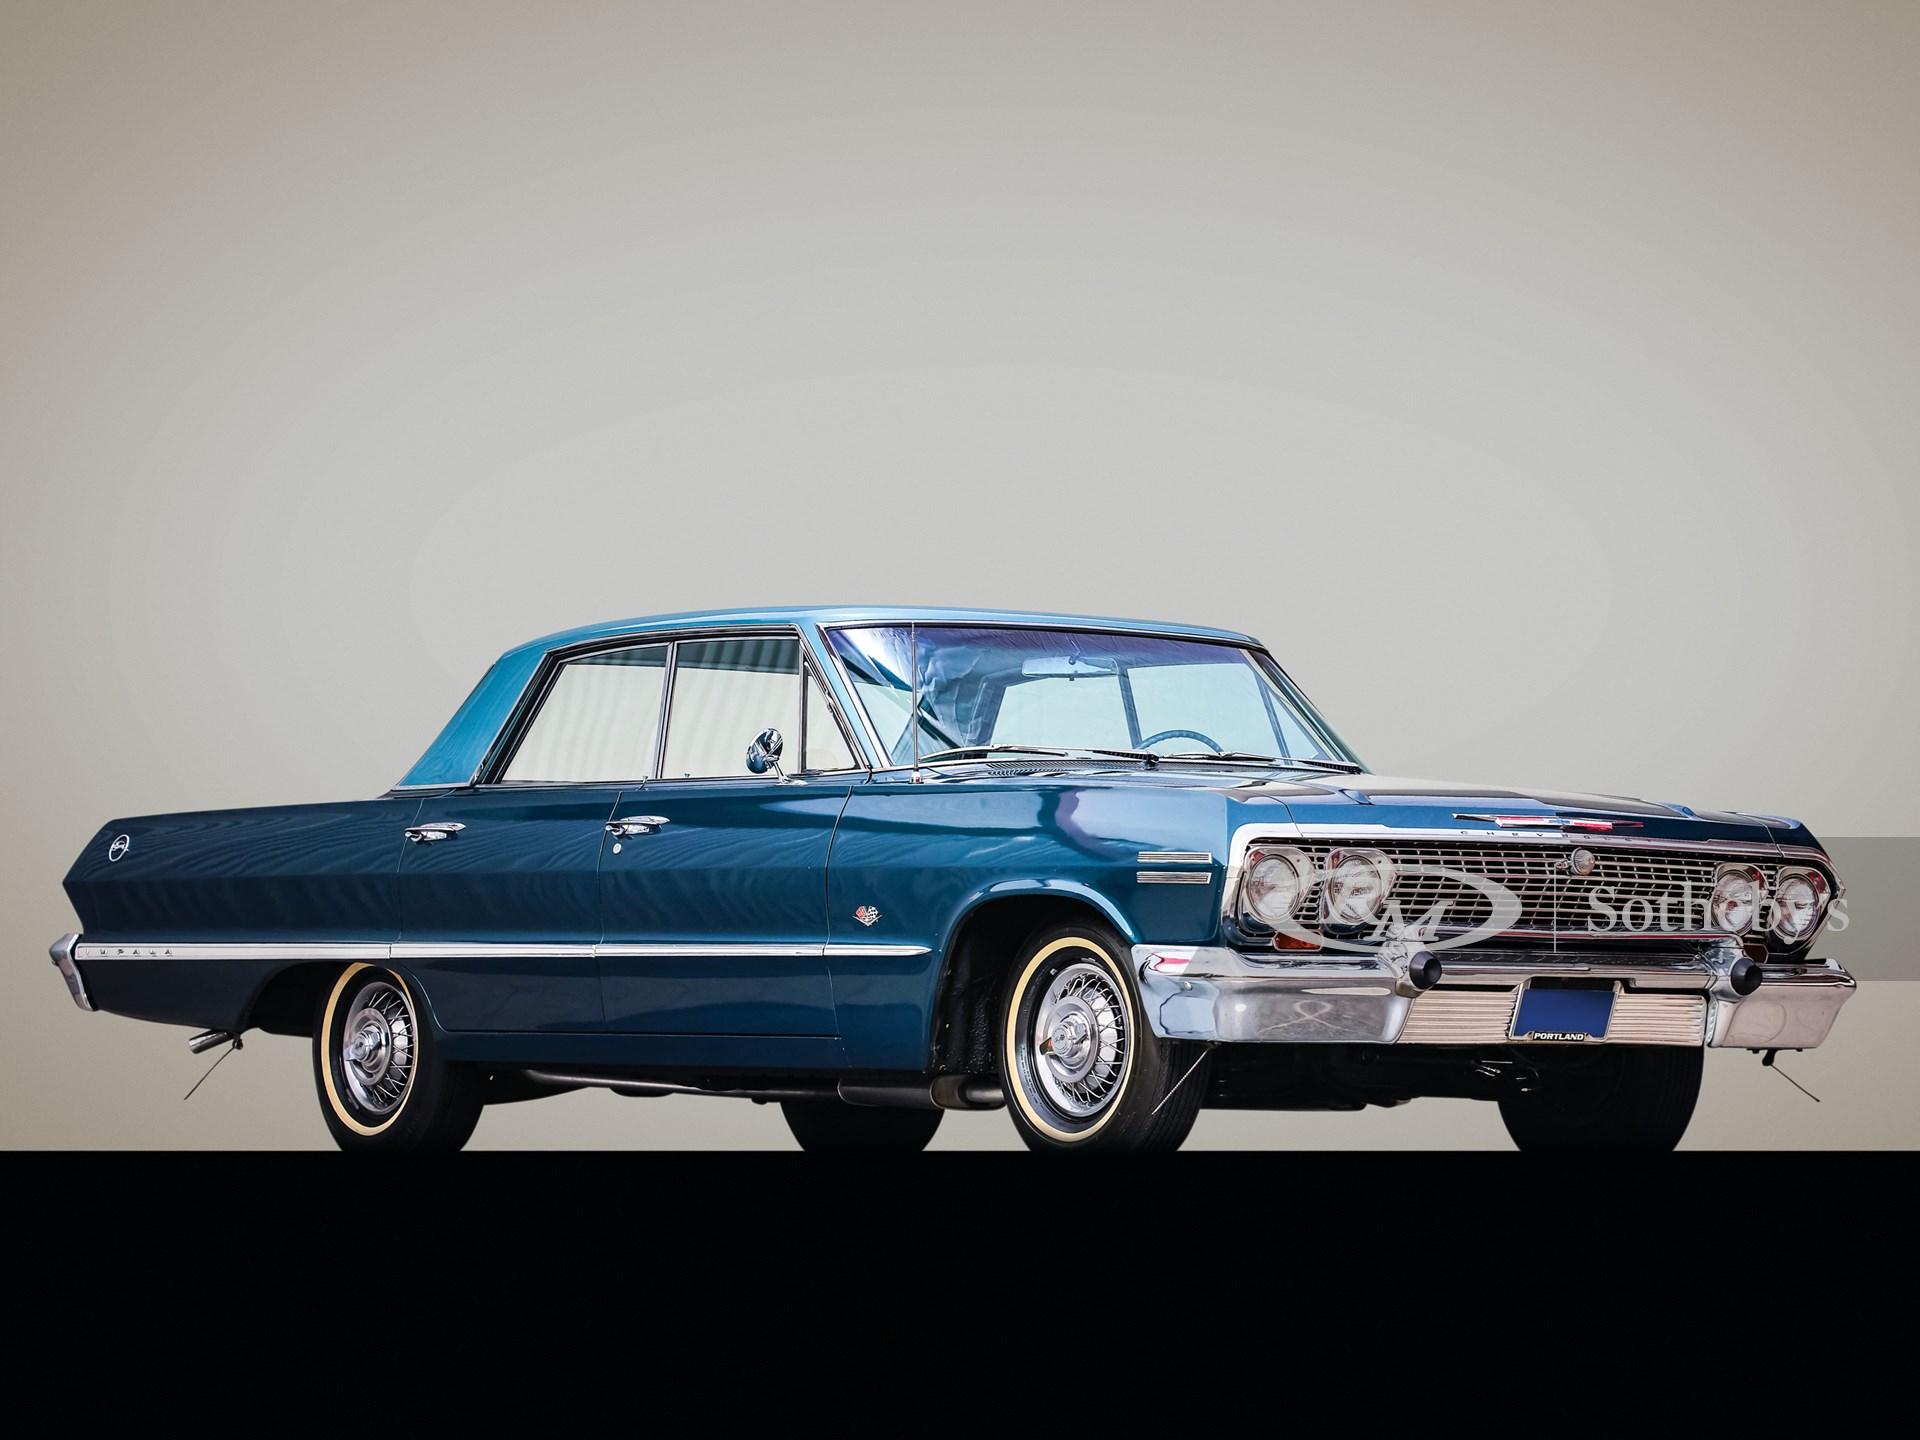 1963 Chevrolet Impala Sport Sedan Arizona 2020 Rm Sotheby S